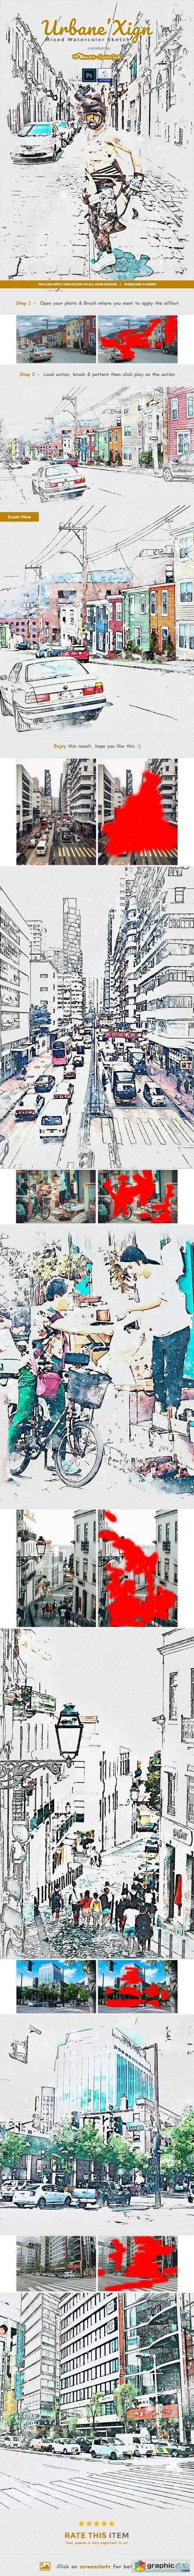 UrbaneXign - Mixed Watercolor Sketch PS Action